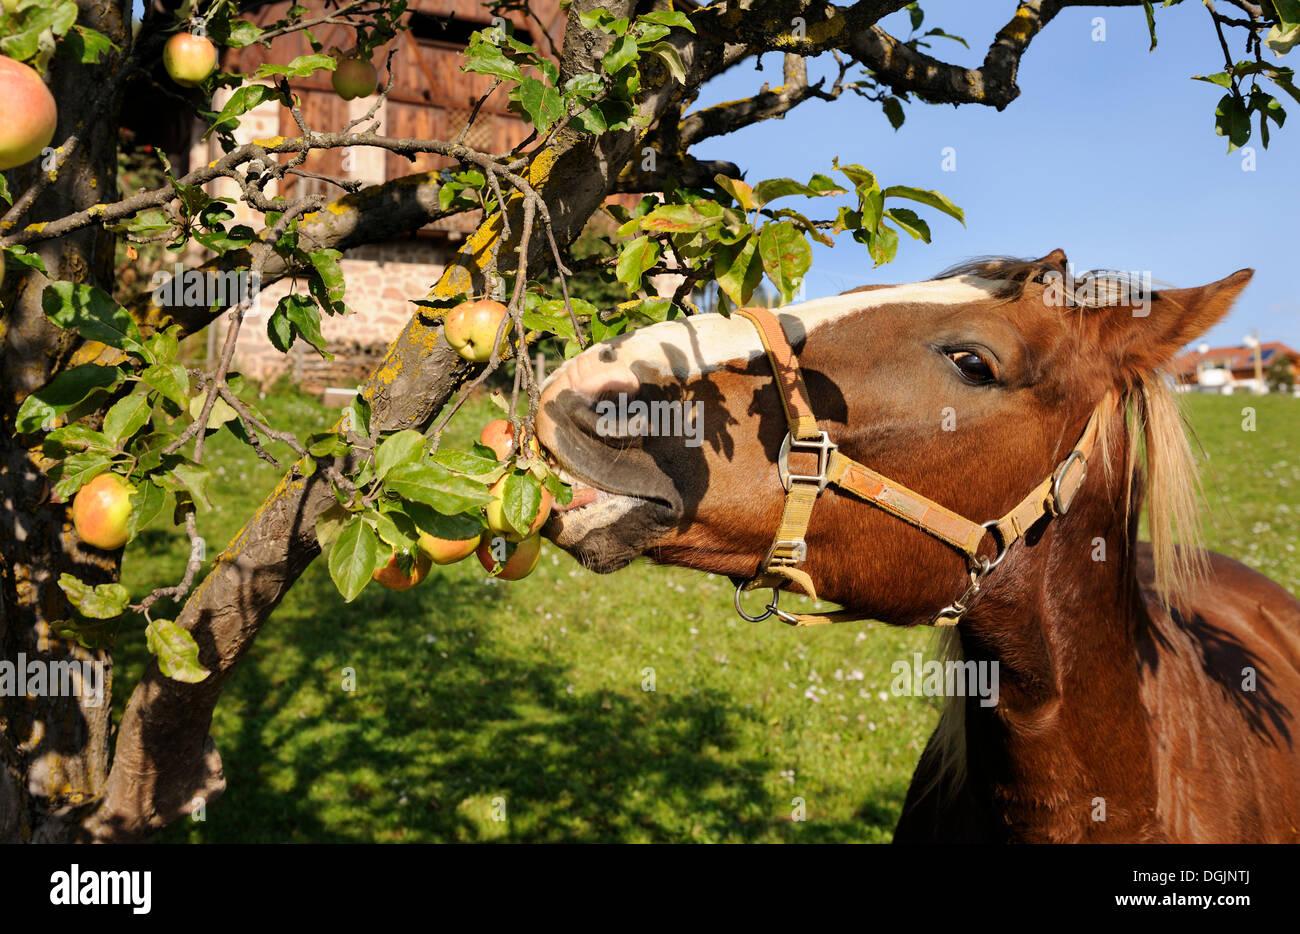 Horse eating apples, Bolzano, South Tyrol, Tyrol, Italy, Europe - Stock Image